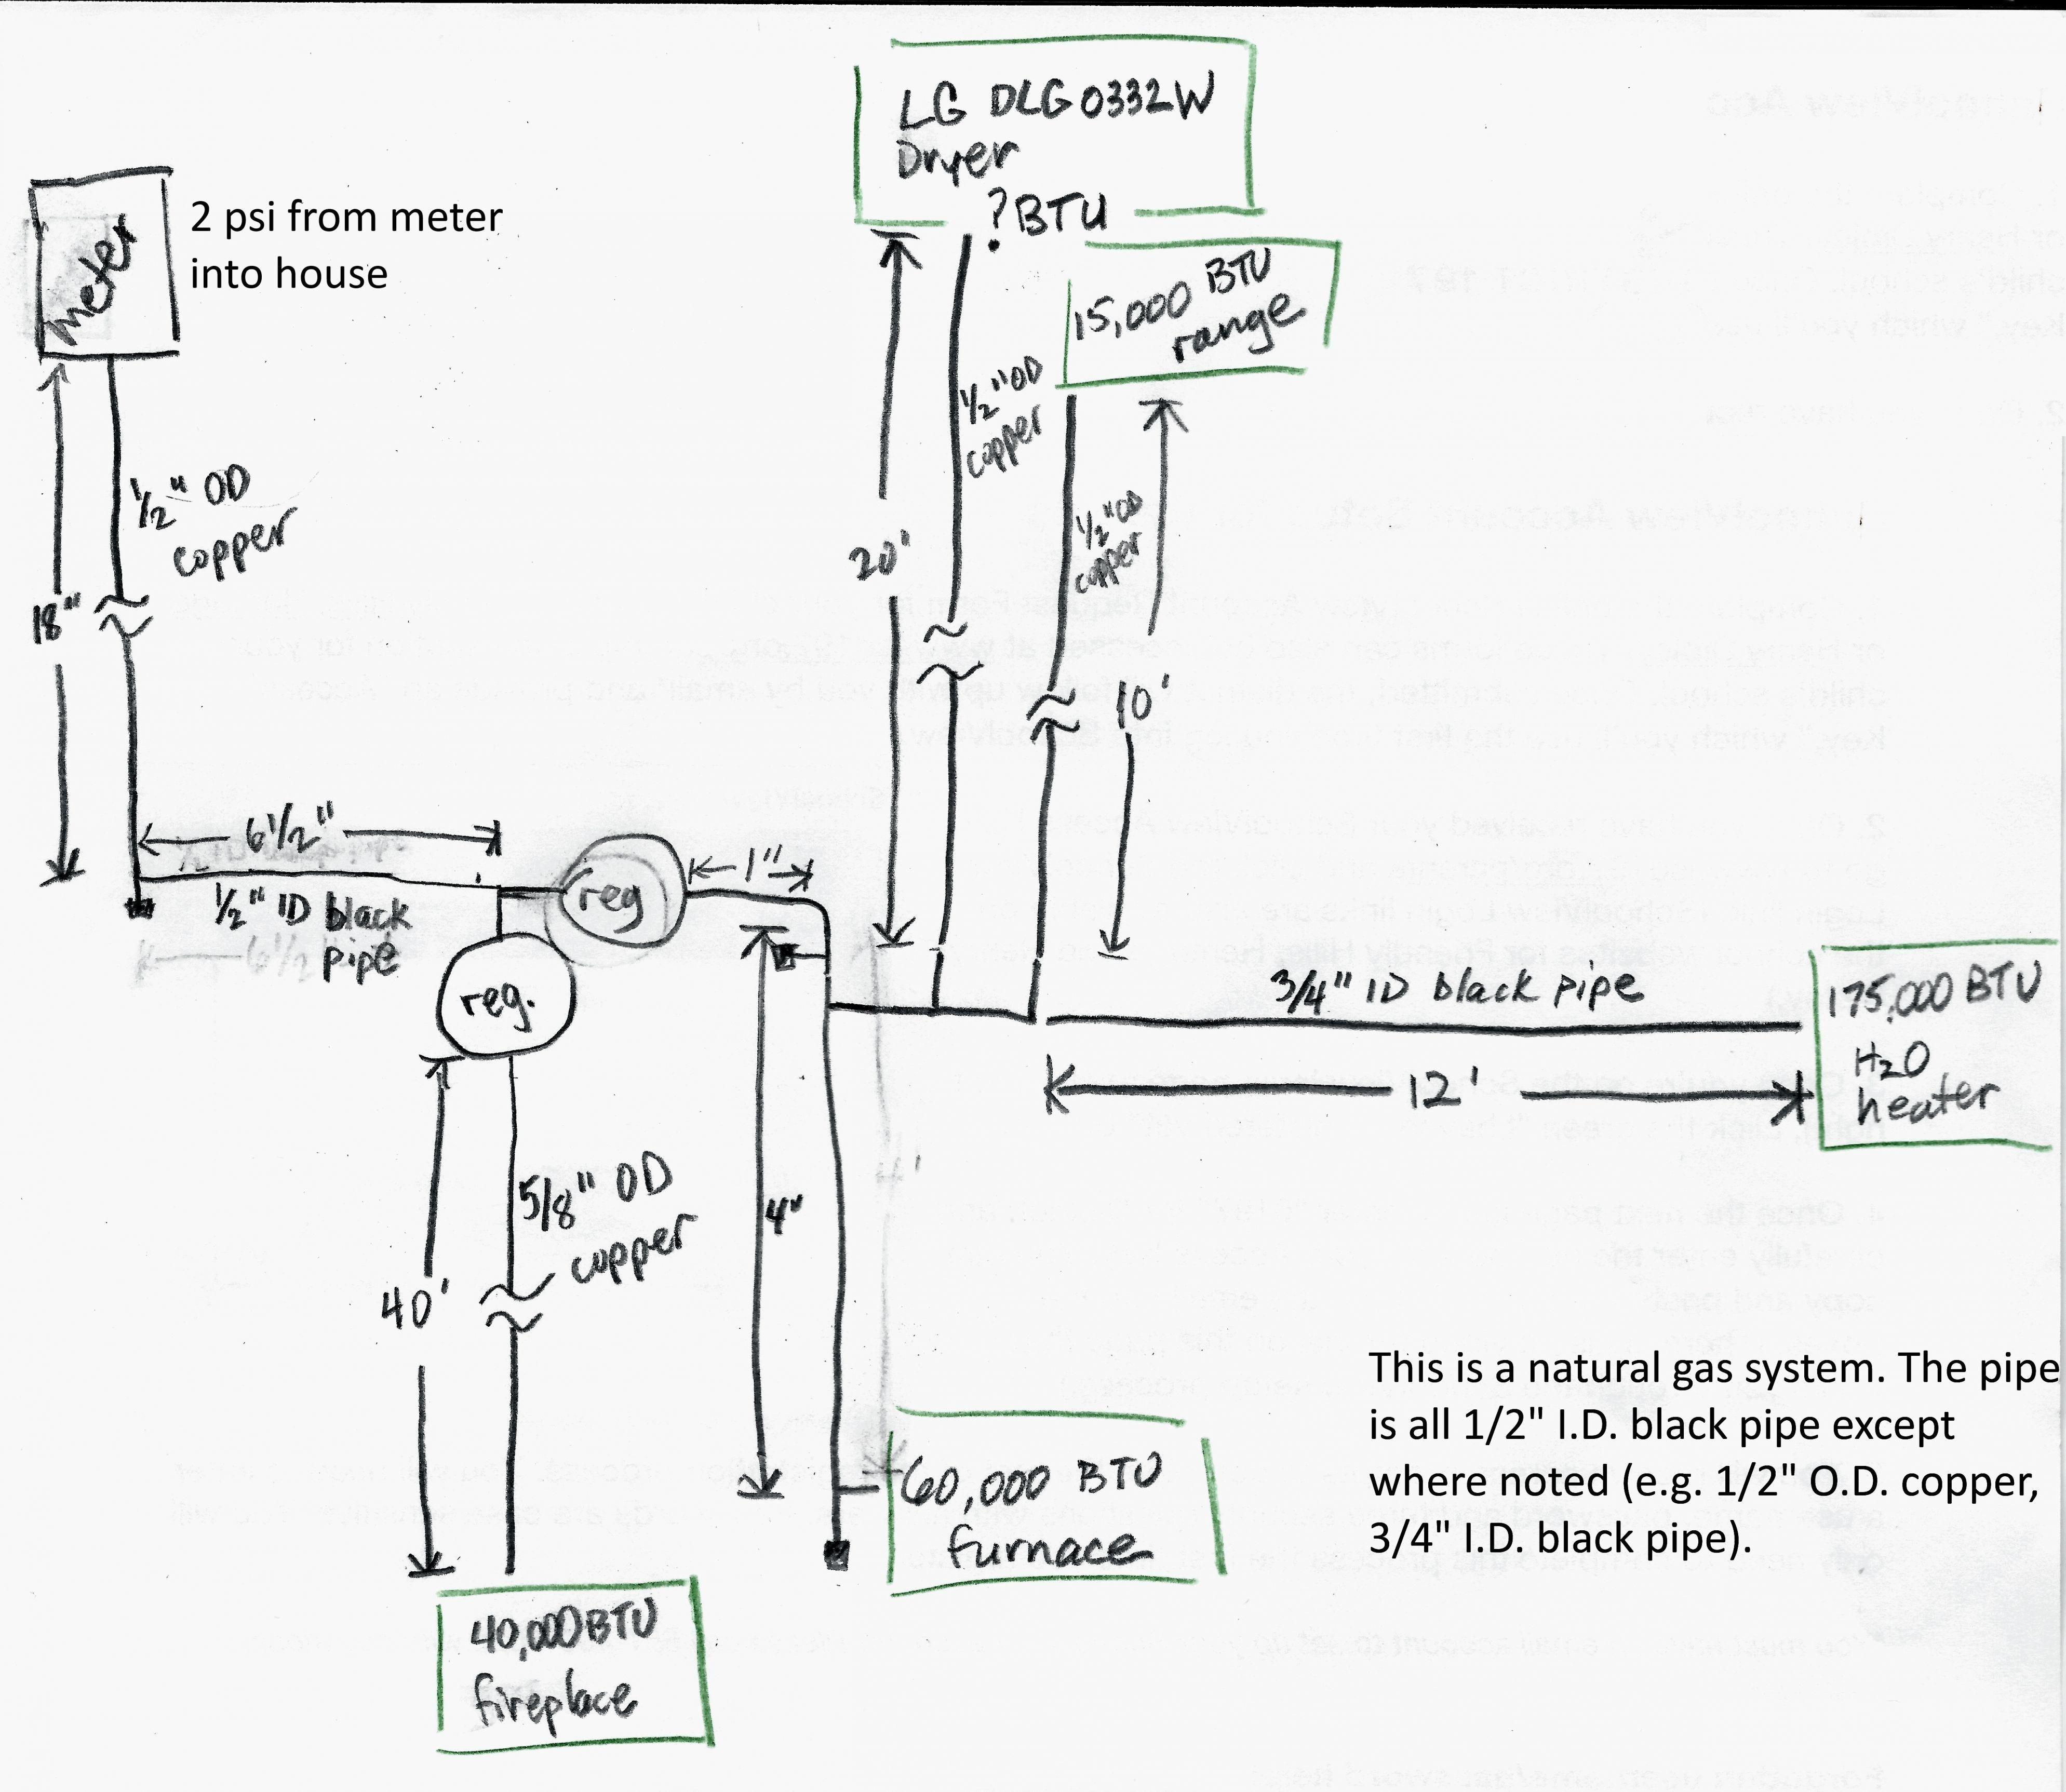 New Wiring Diagram for Trailers Australia diagramsample